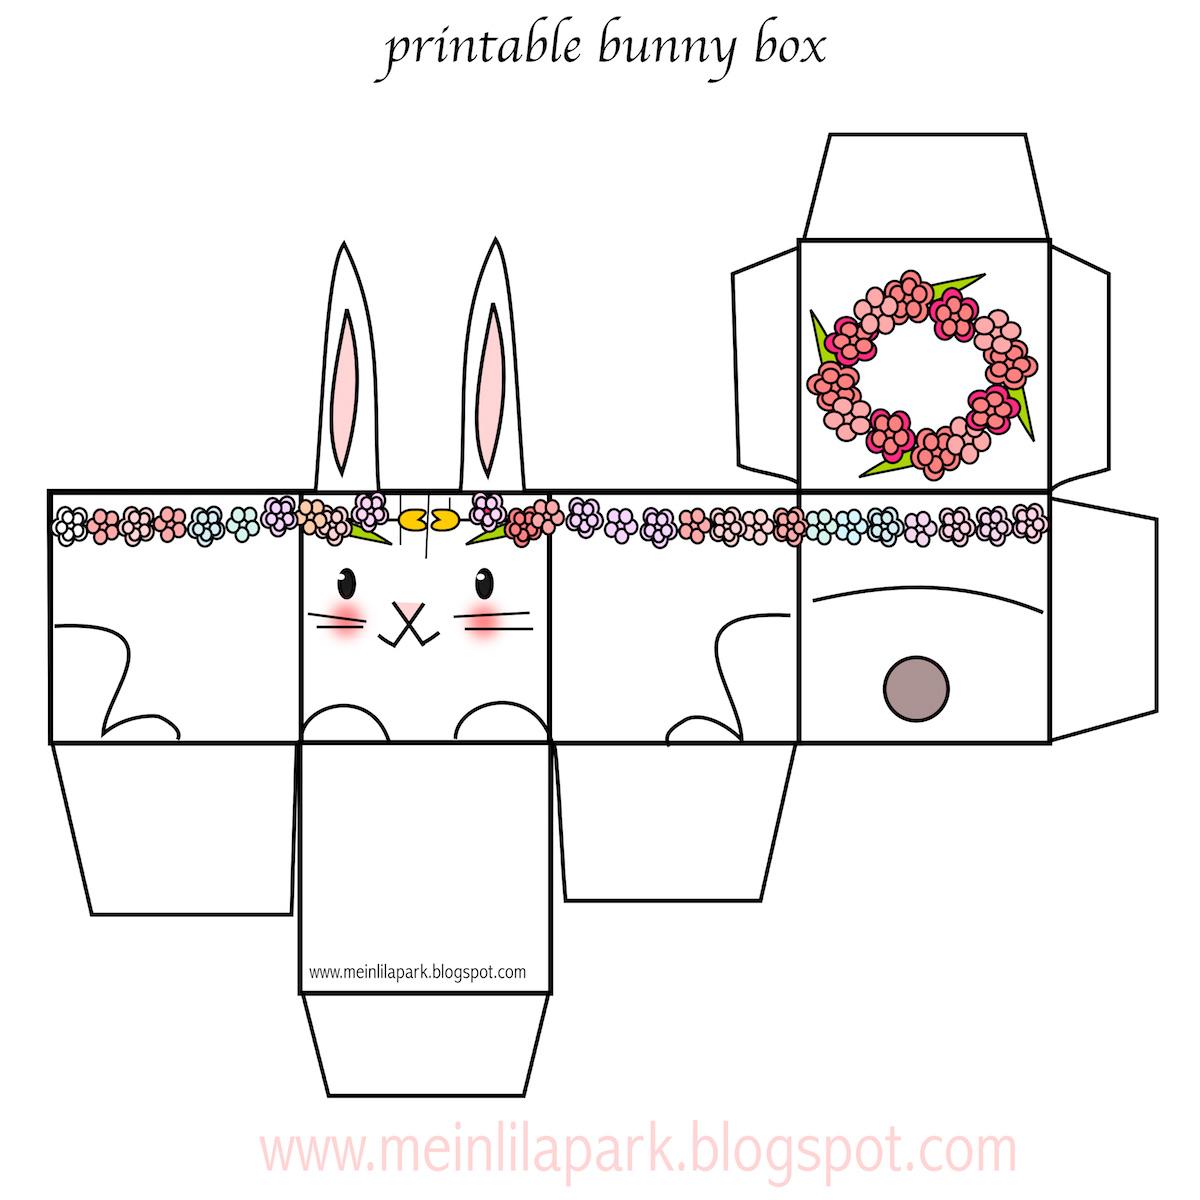 Free printable easter bunny box ausdruckbare diy box freebie free printable easter bunny box ausdruckbare diy box freebie negle Images